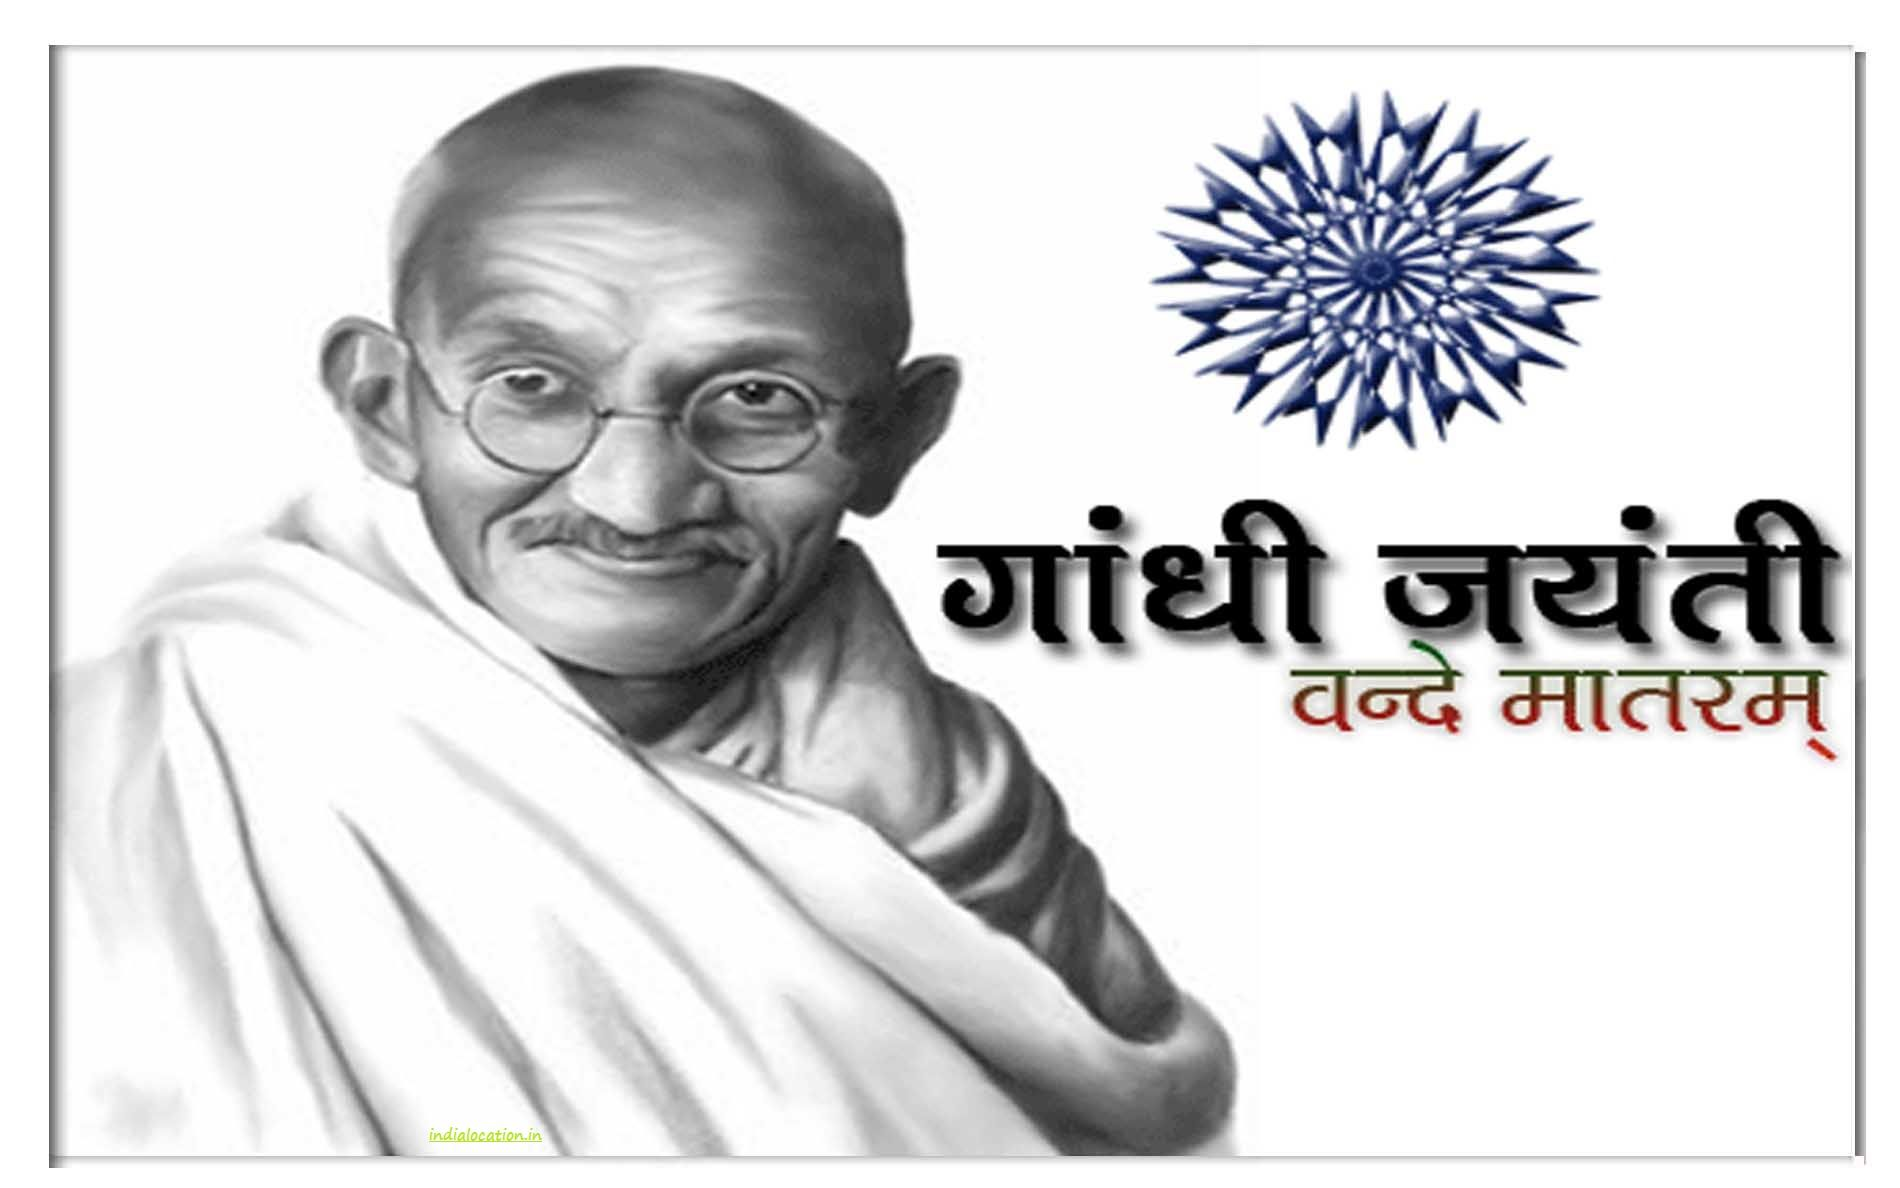 mahatma gandhi jayanti wallpapers images pics free